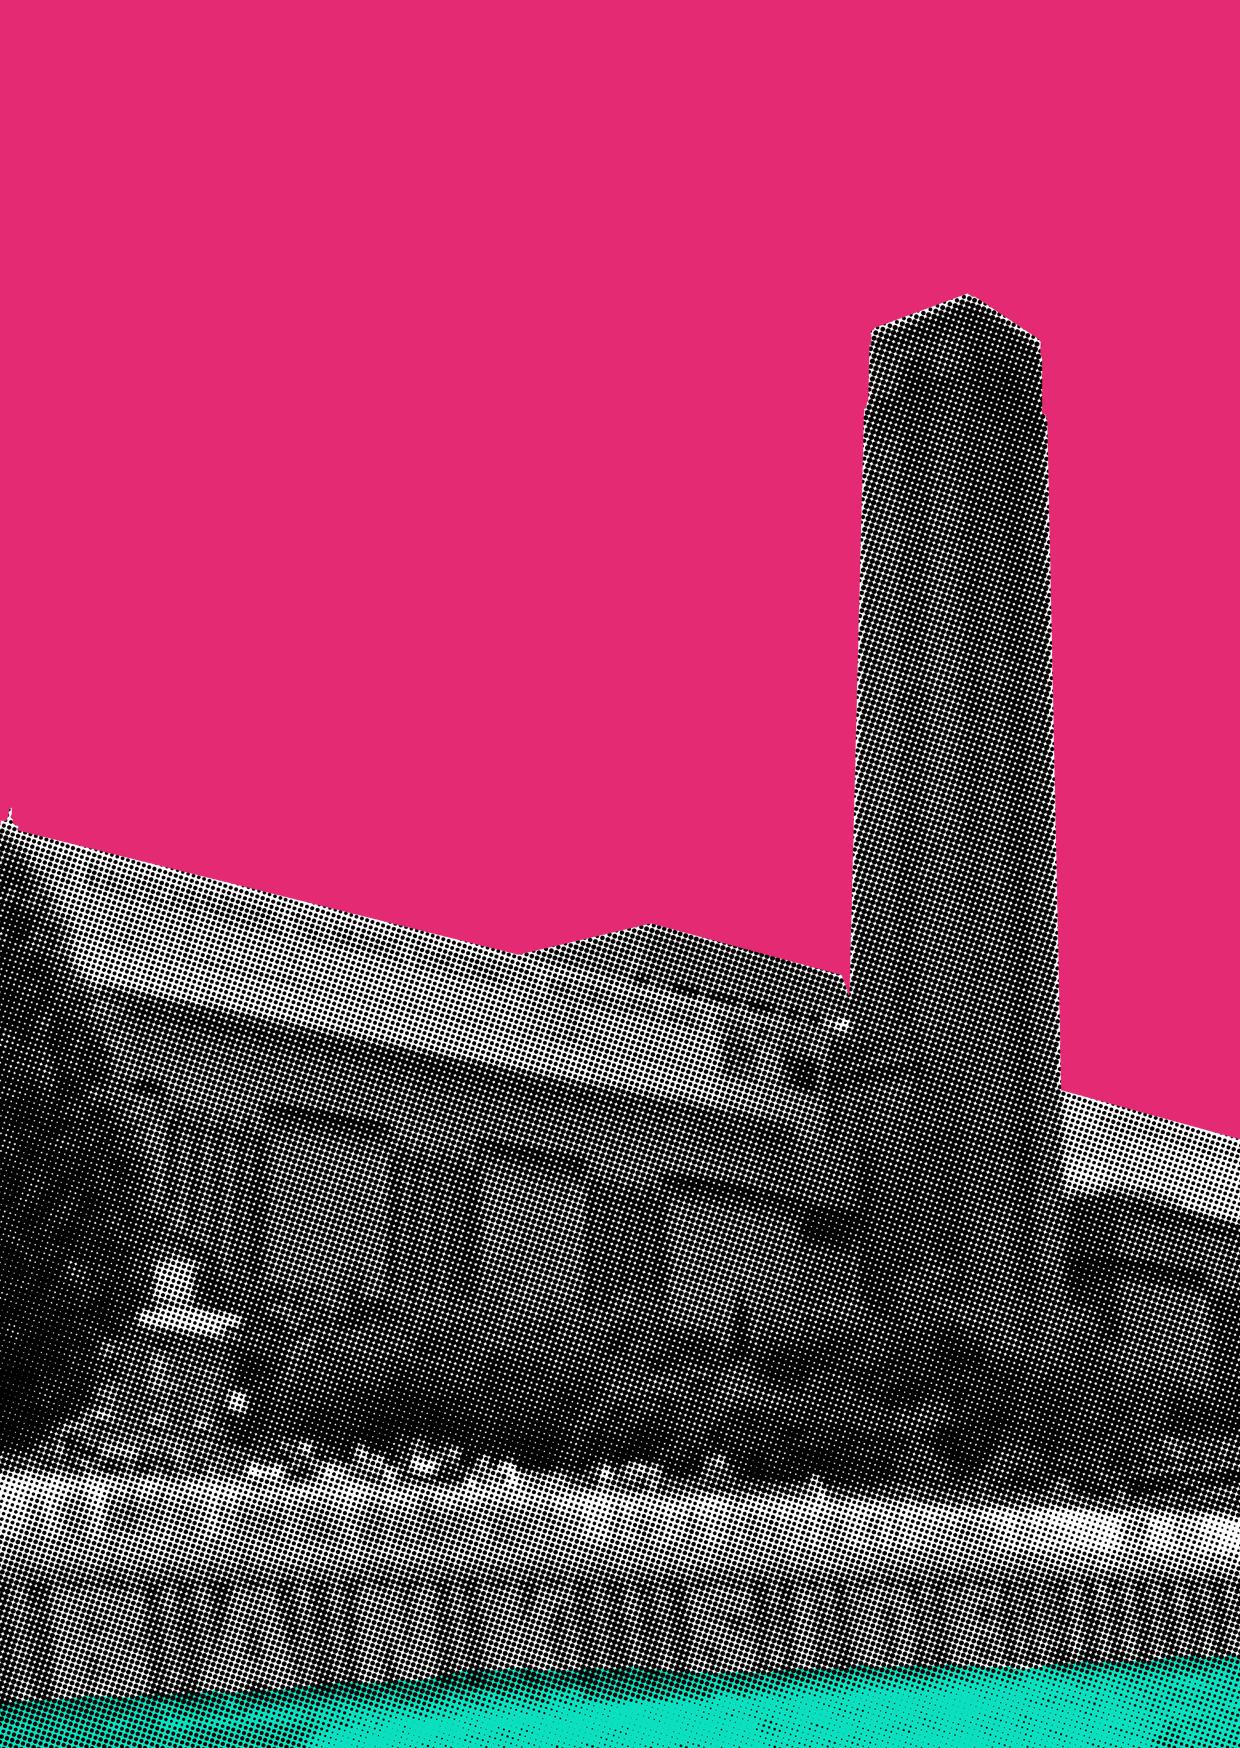 Jayson Lilley Bankside 2 AOAPC Pink.jpg